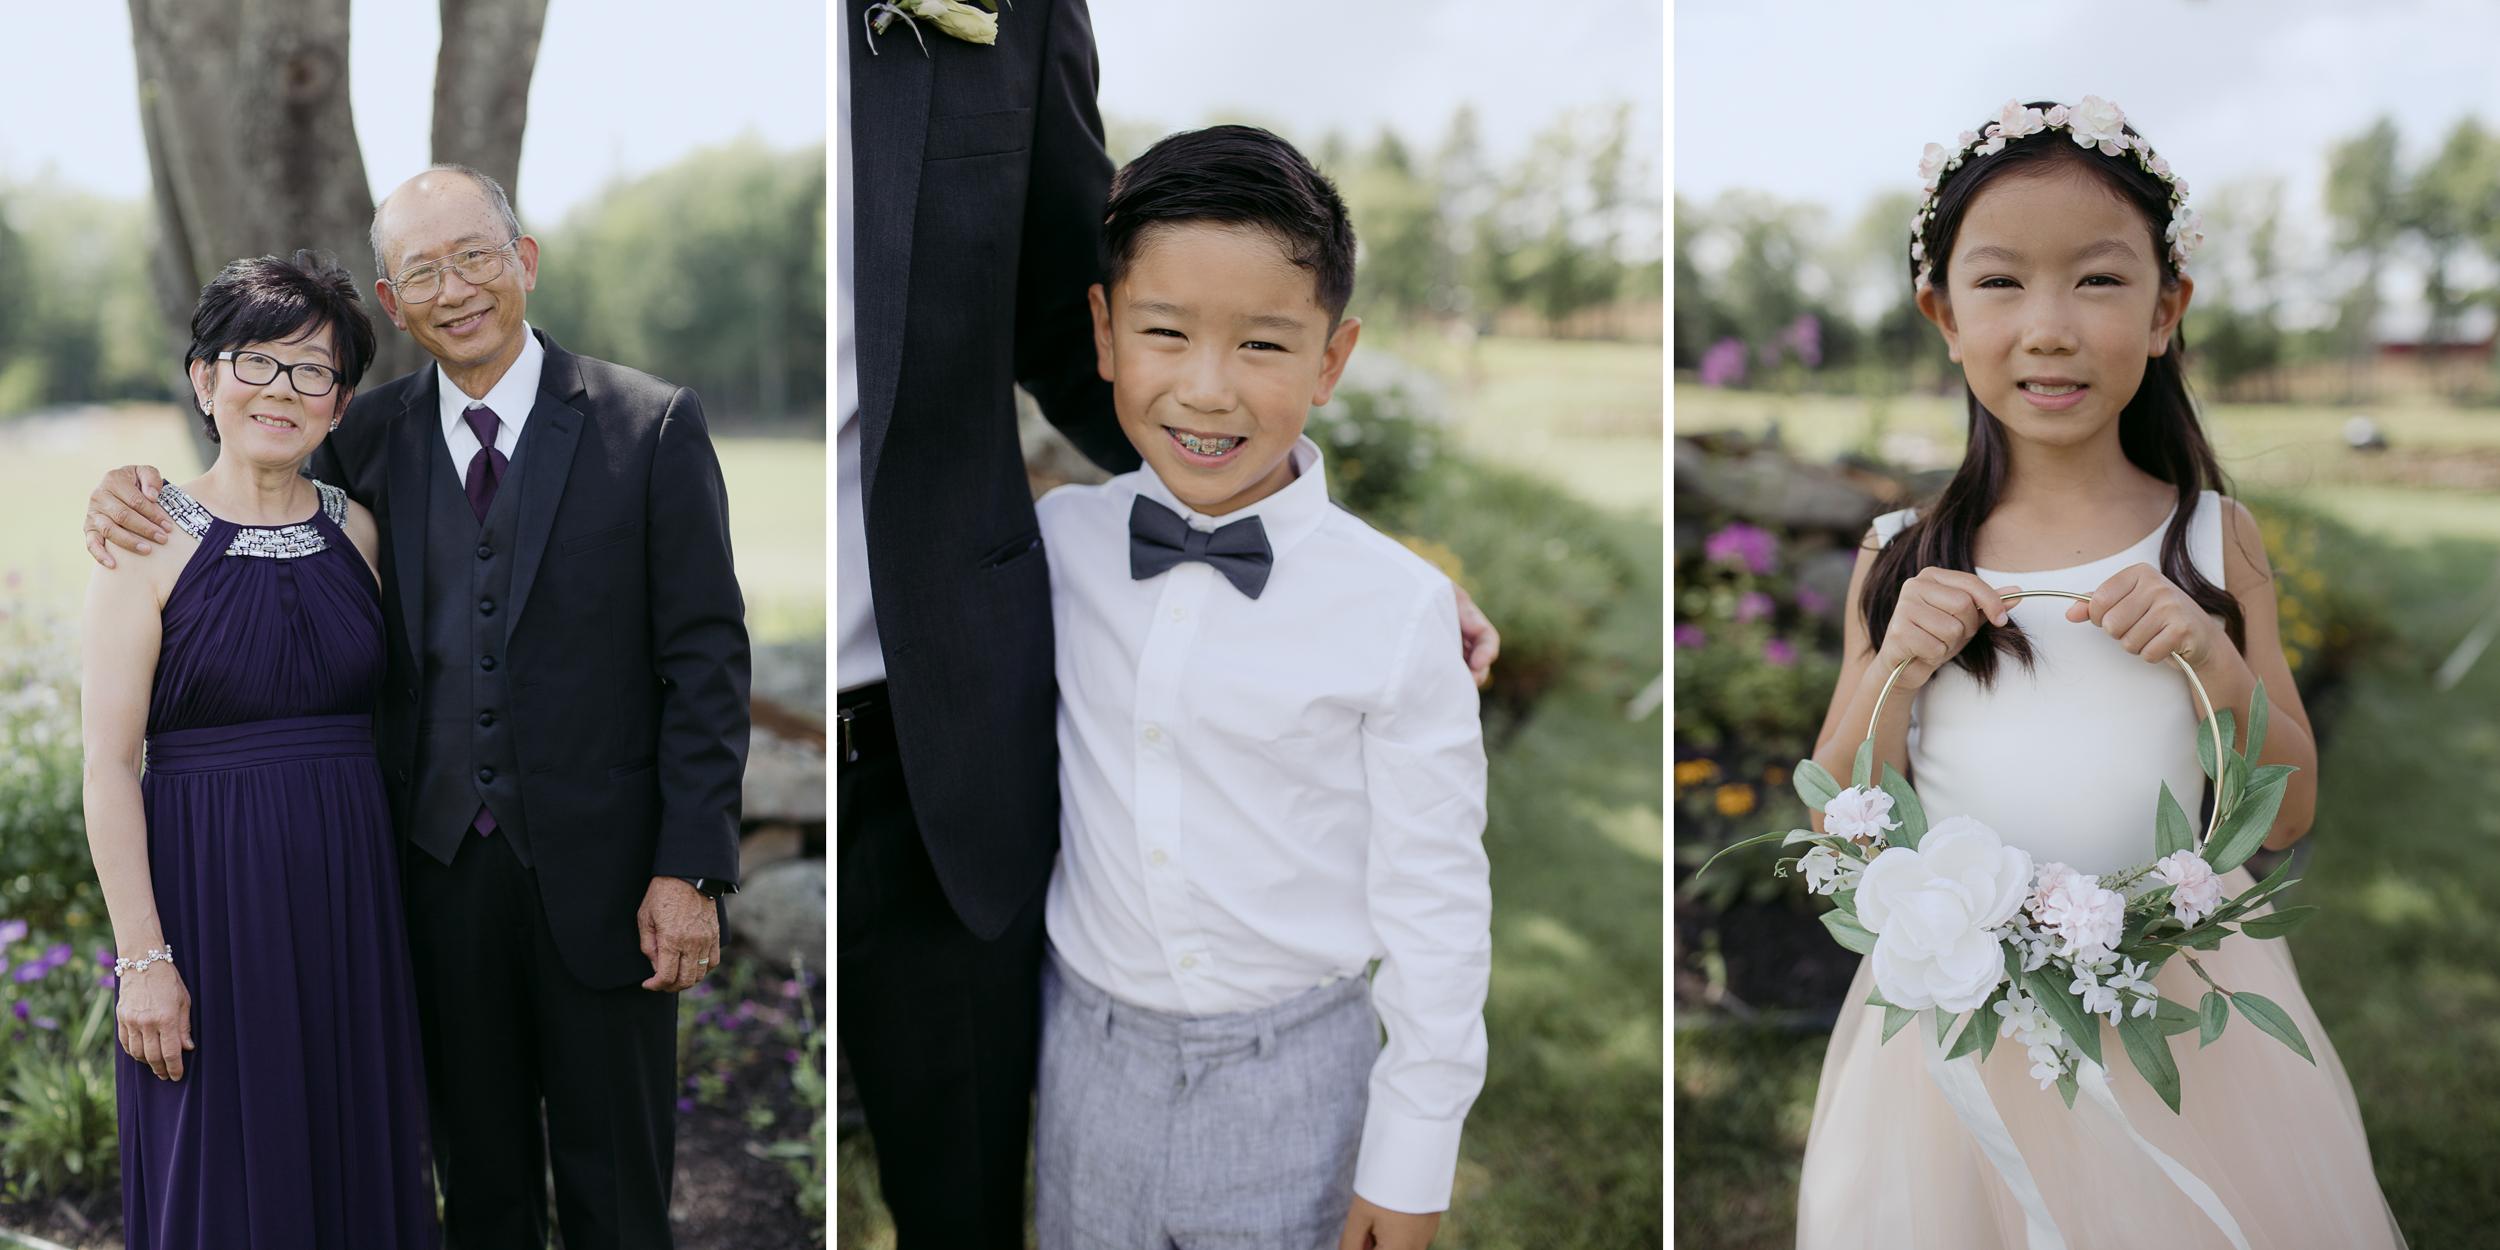 william_allen_farm_wedding_pownal_maine_ilkatayler-9.jpg